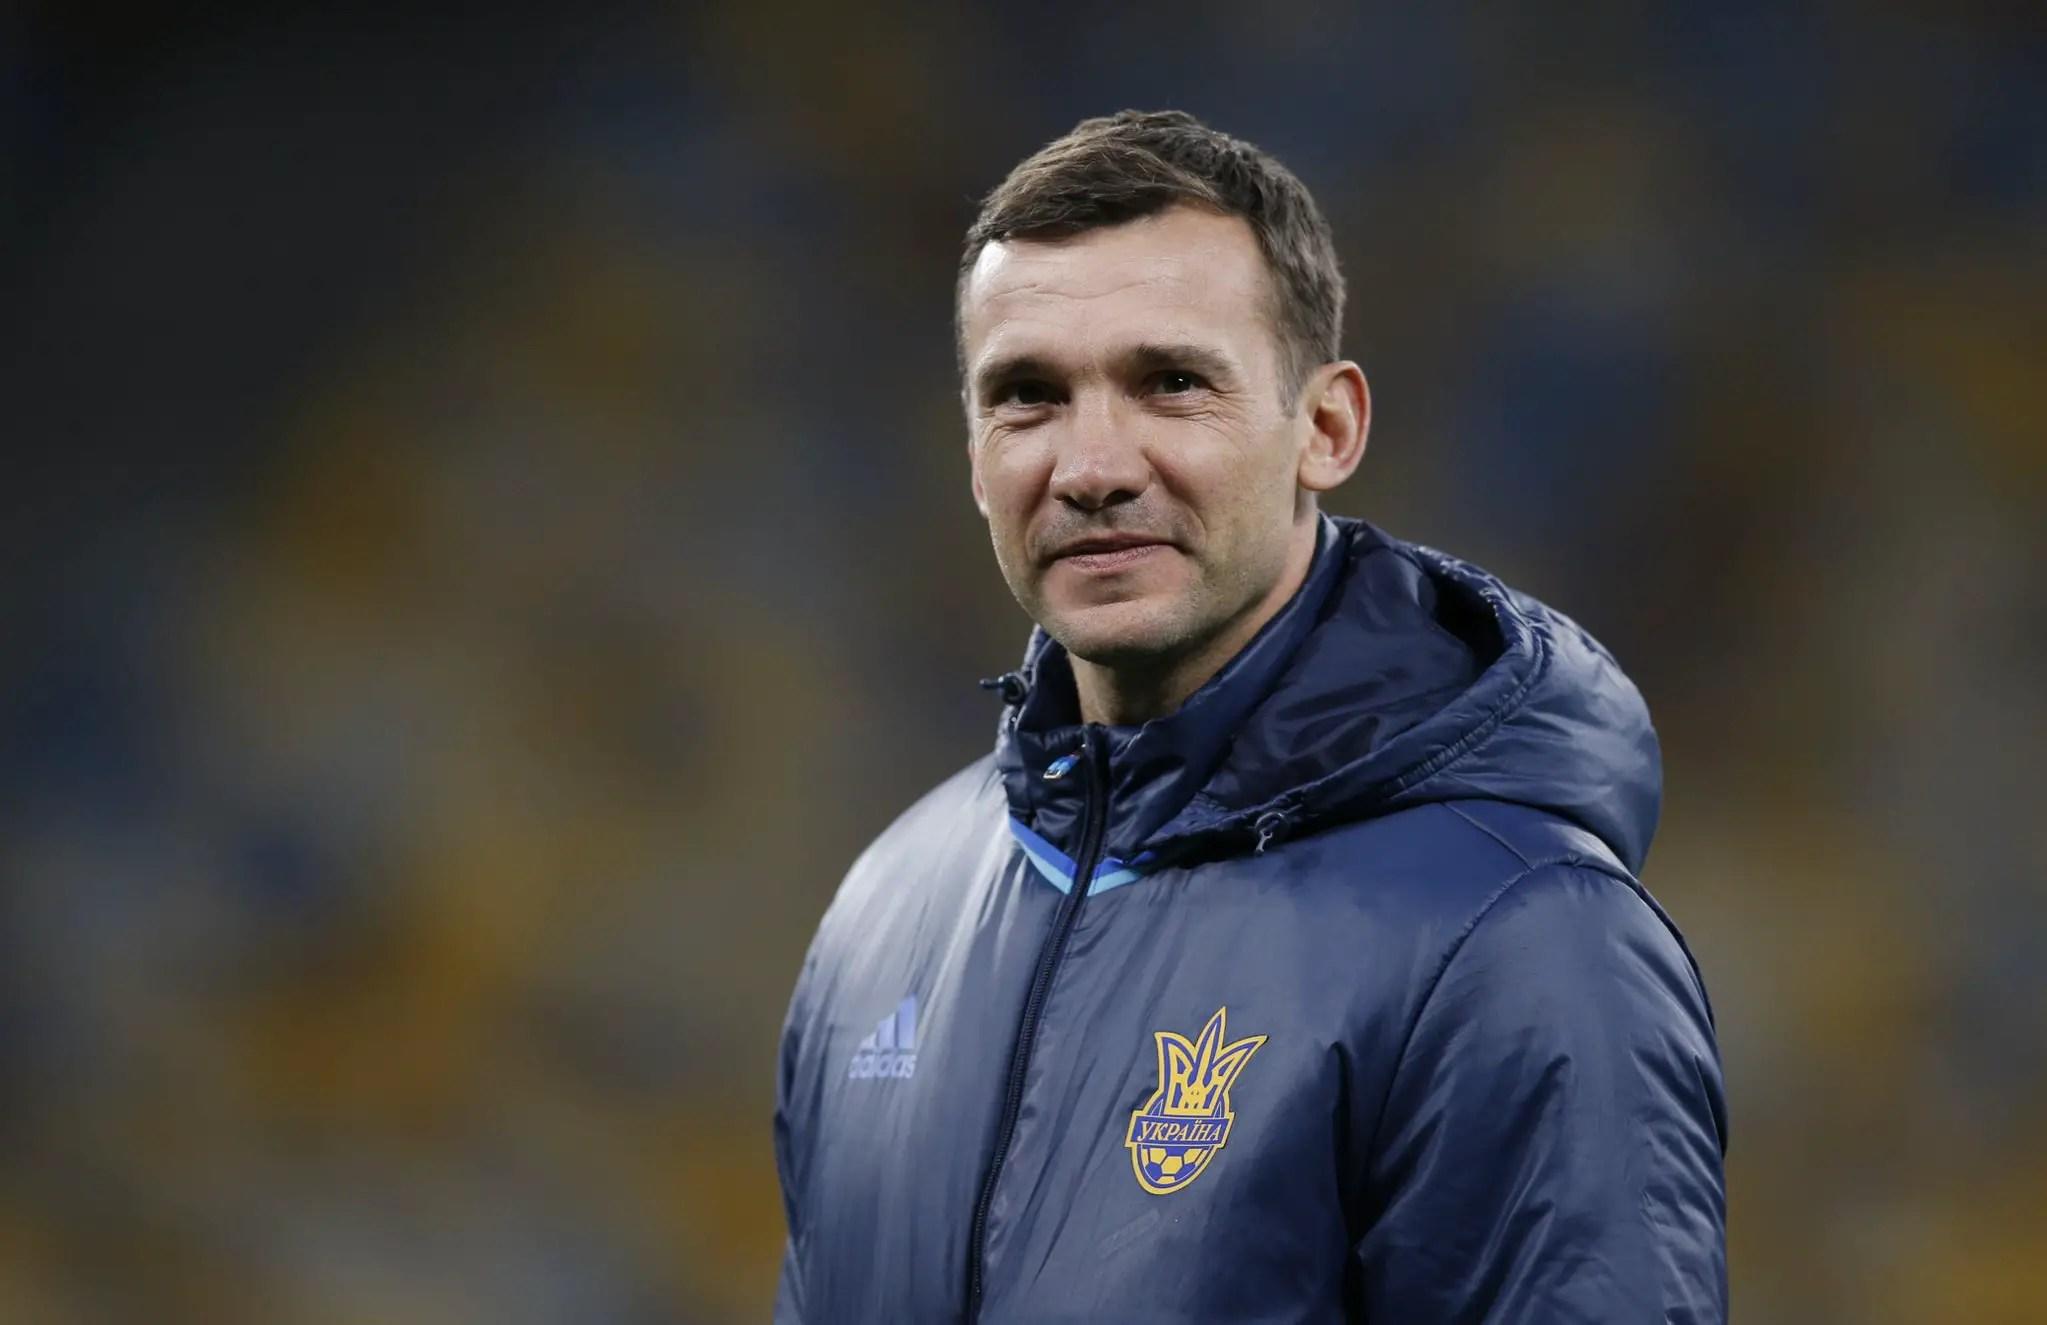 Ex-Chelsea Striker Shevchenko Named Ukraine Coach